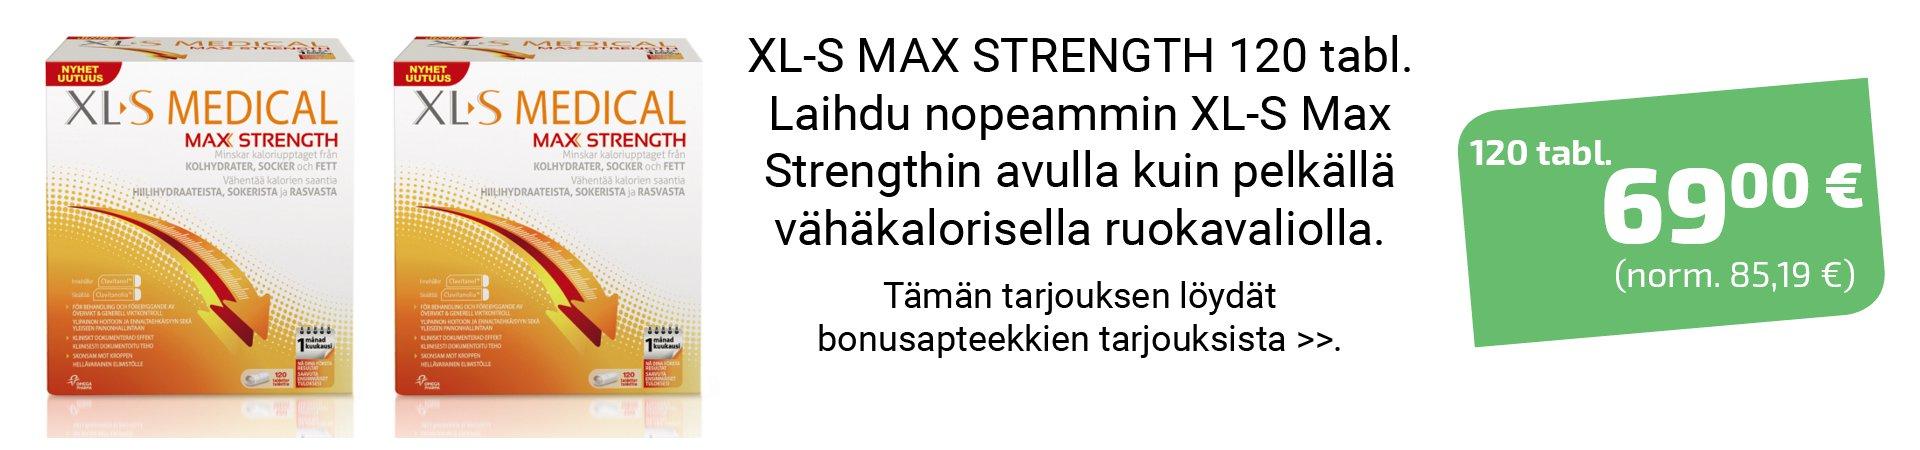 xl-s medical max strength tarjous